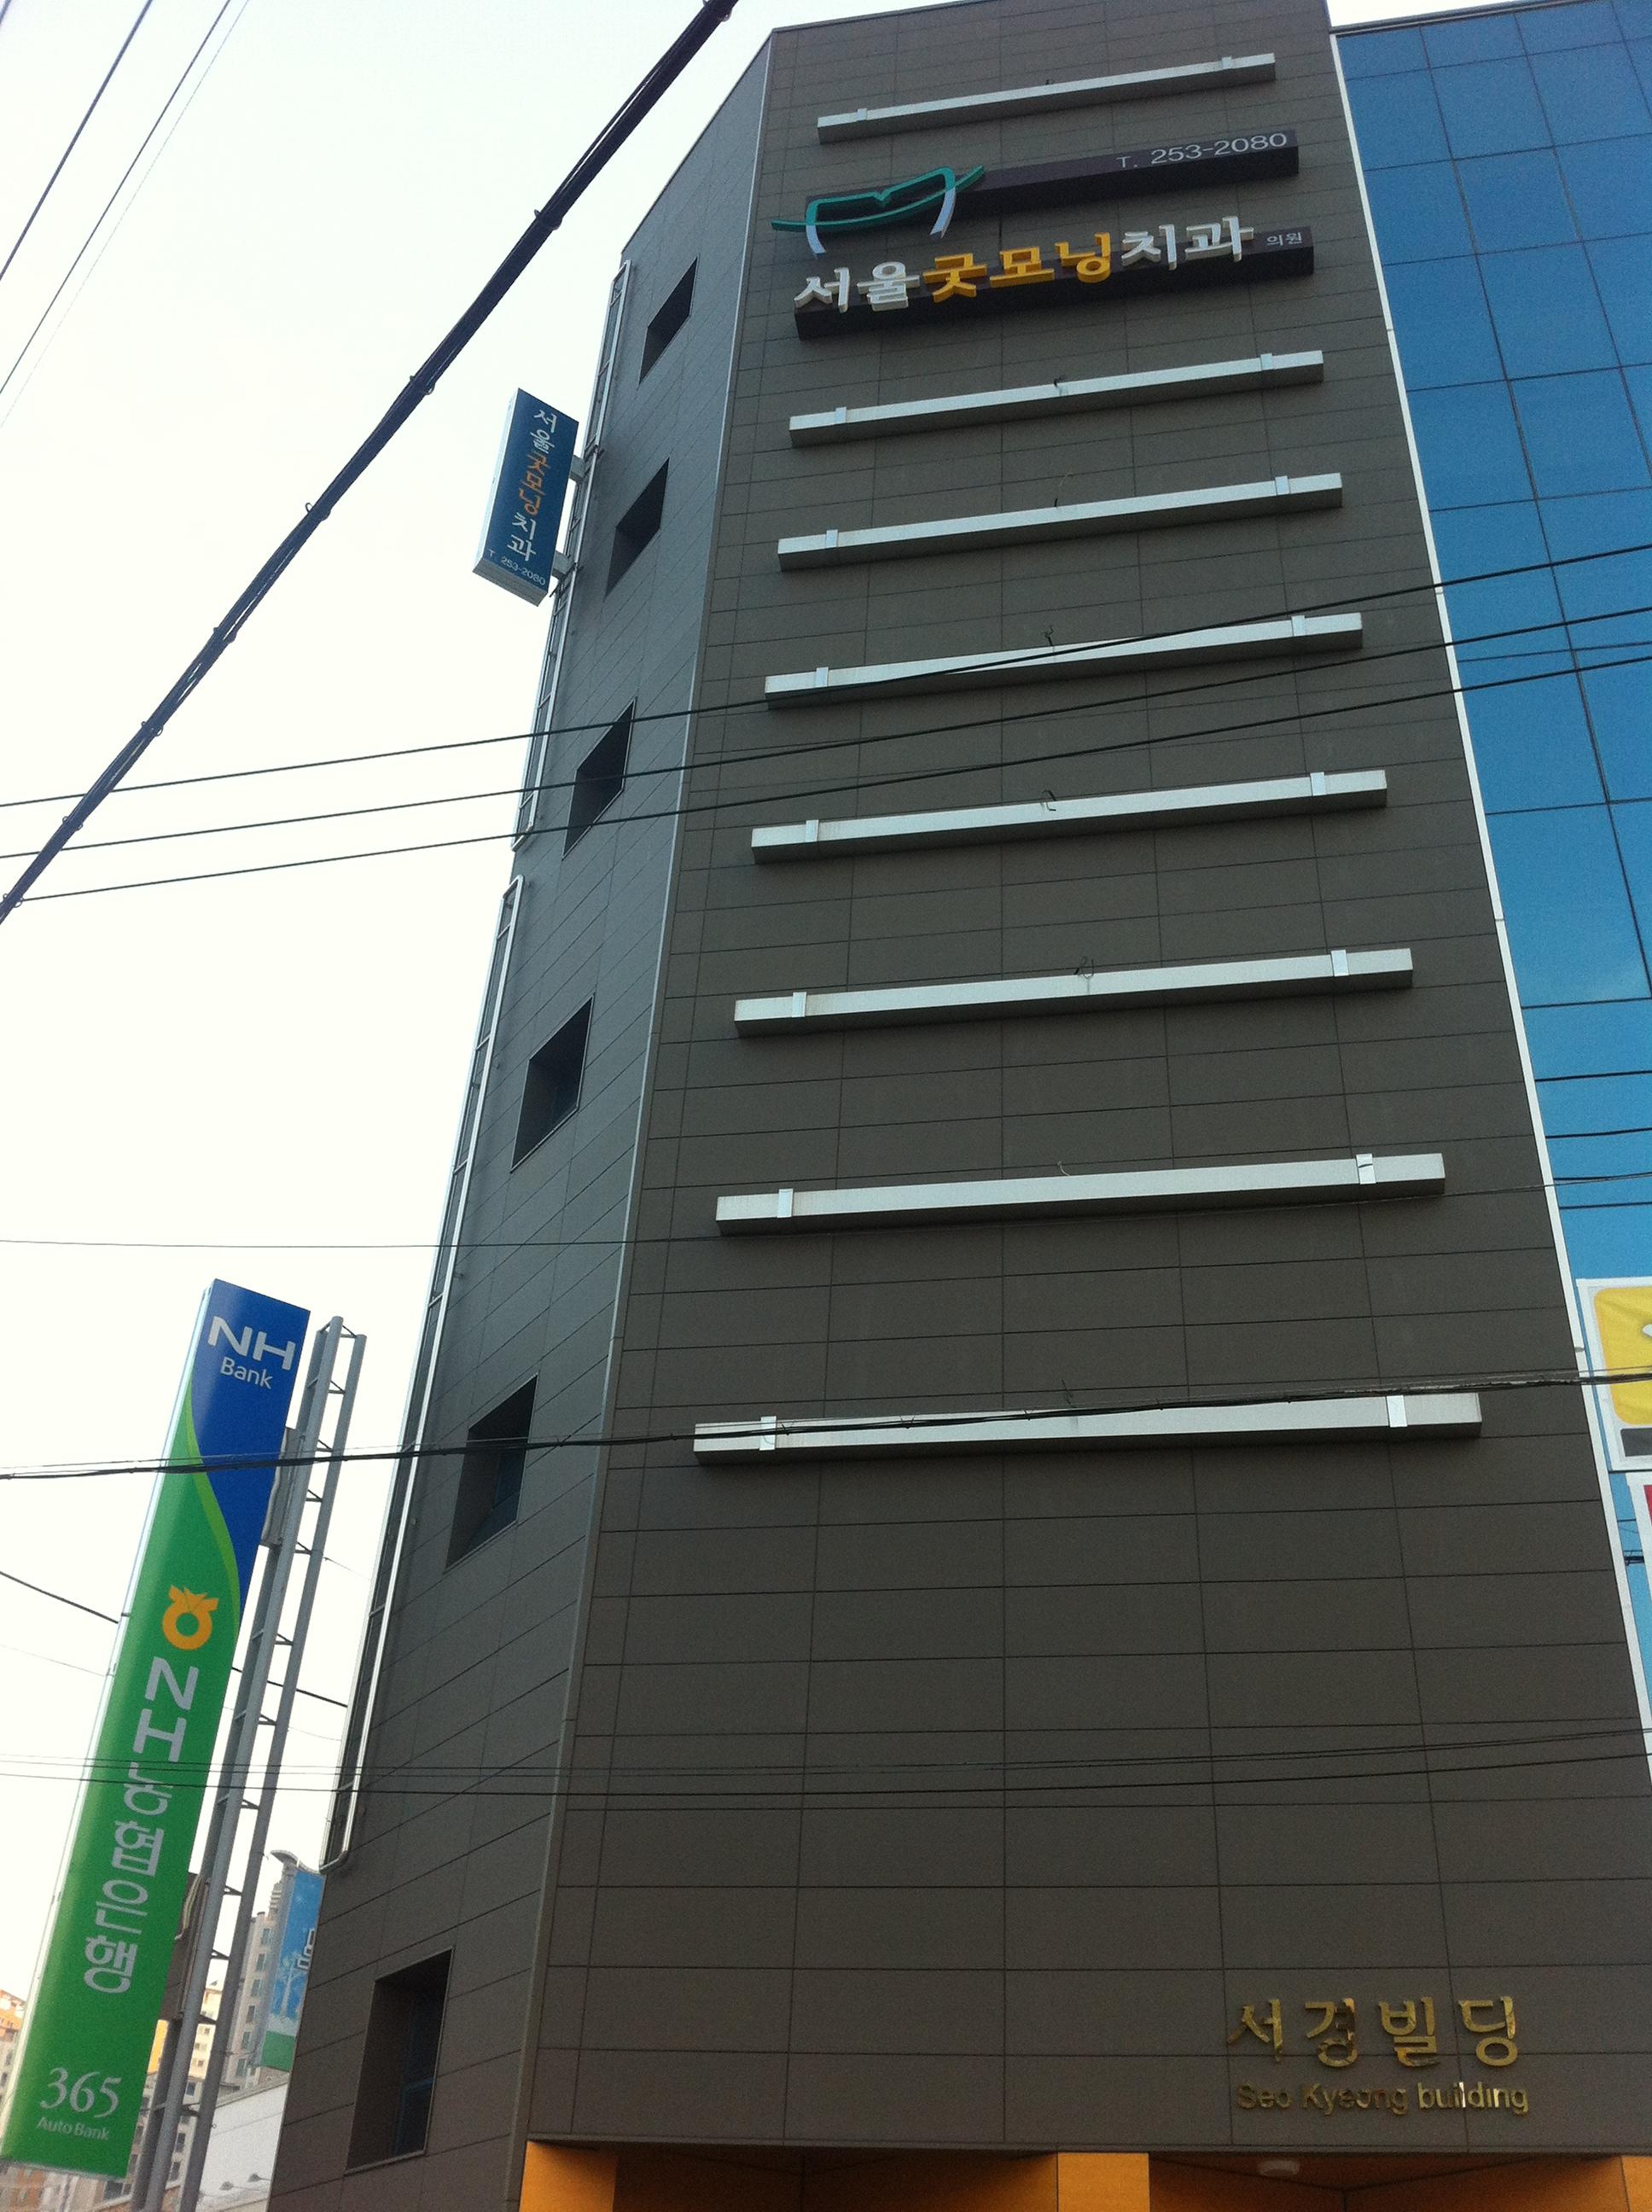 SEO Kyeong Building South Korea Exterior Cladding Panels